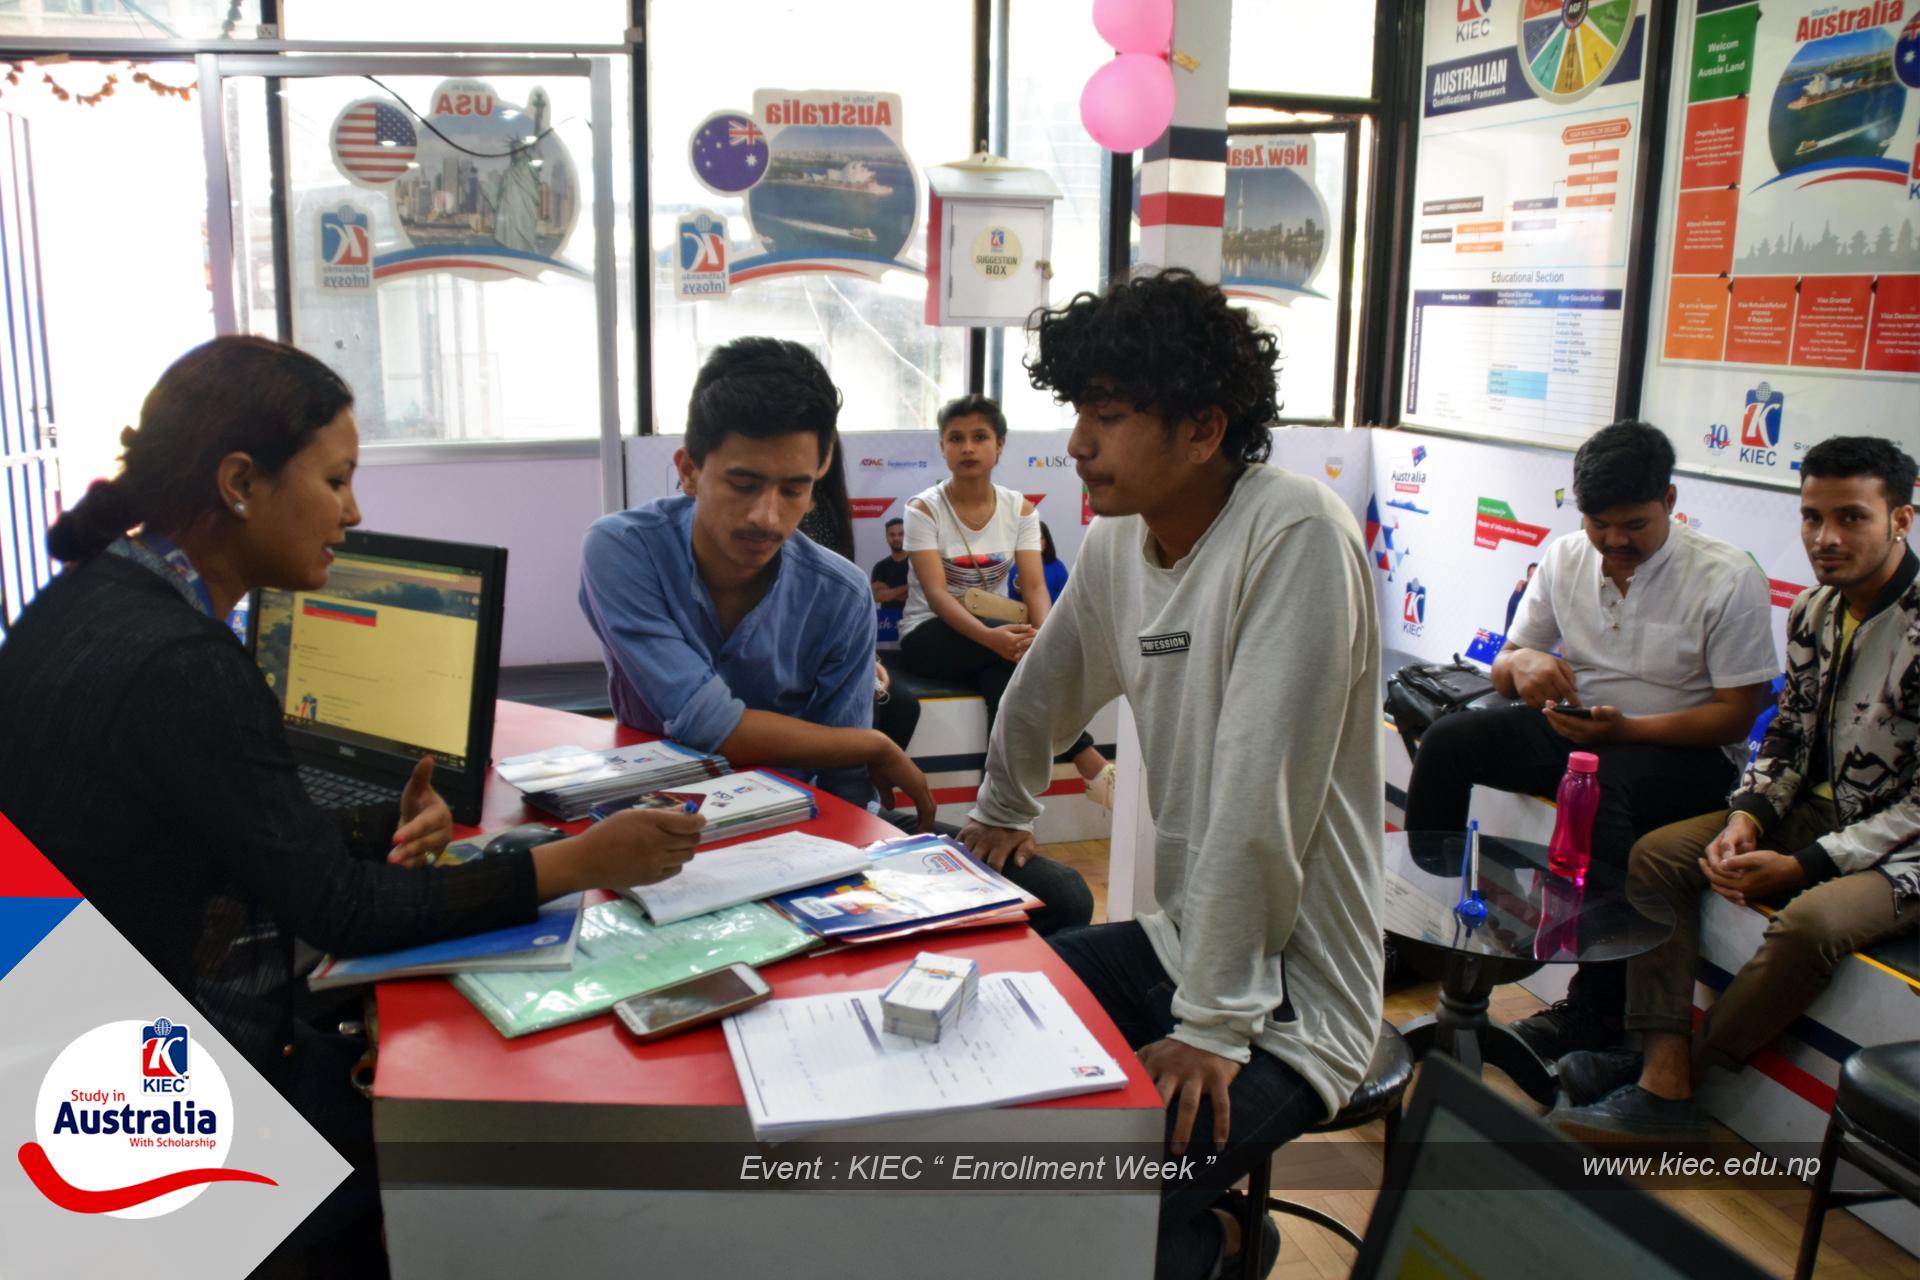 KIEC Counsellor Shyam Dahal Pose